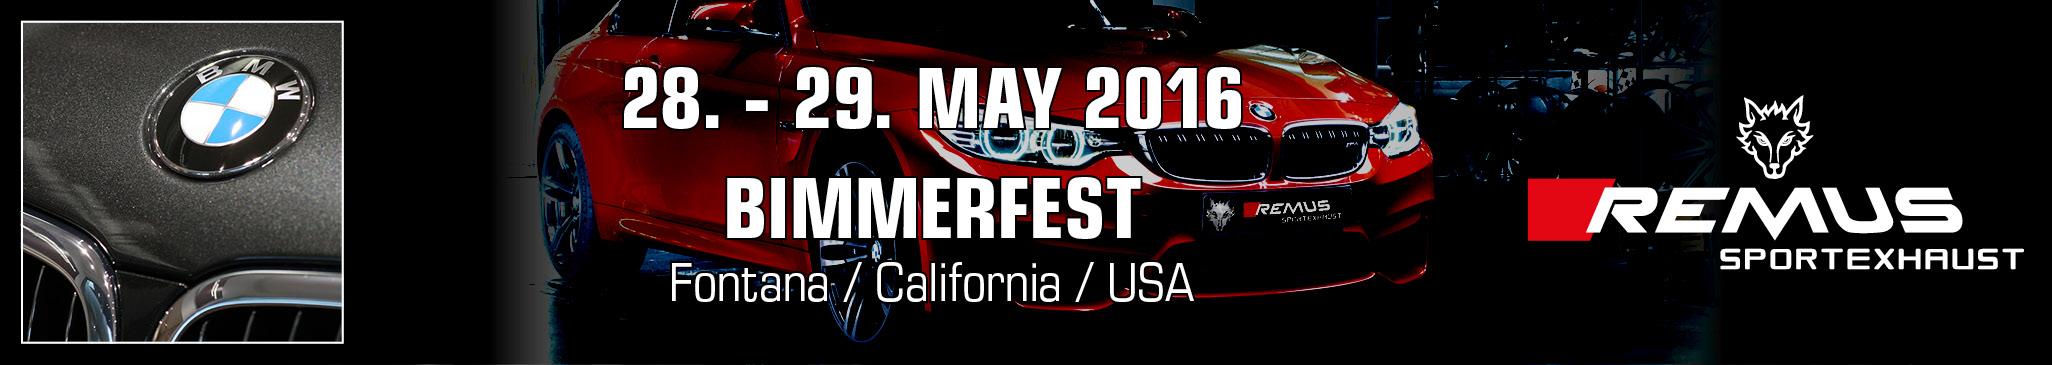 bimmerfest-2016